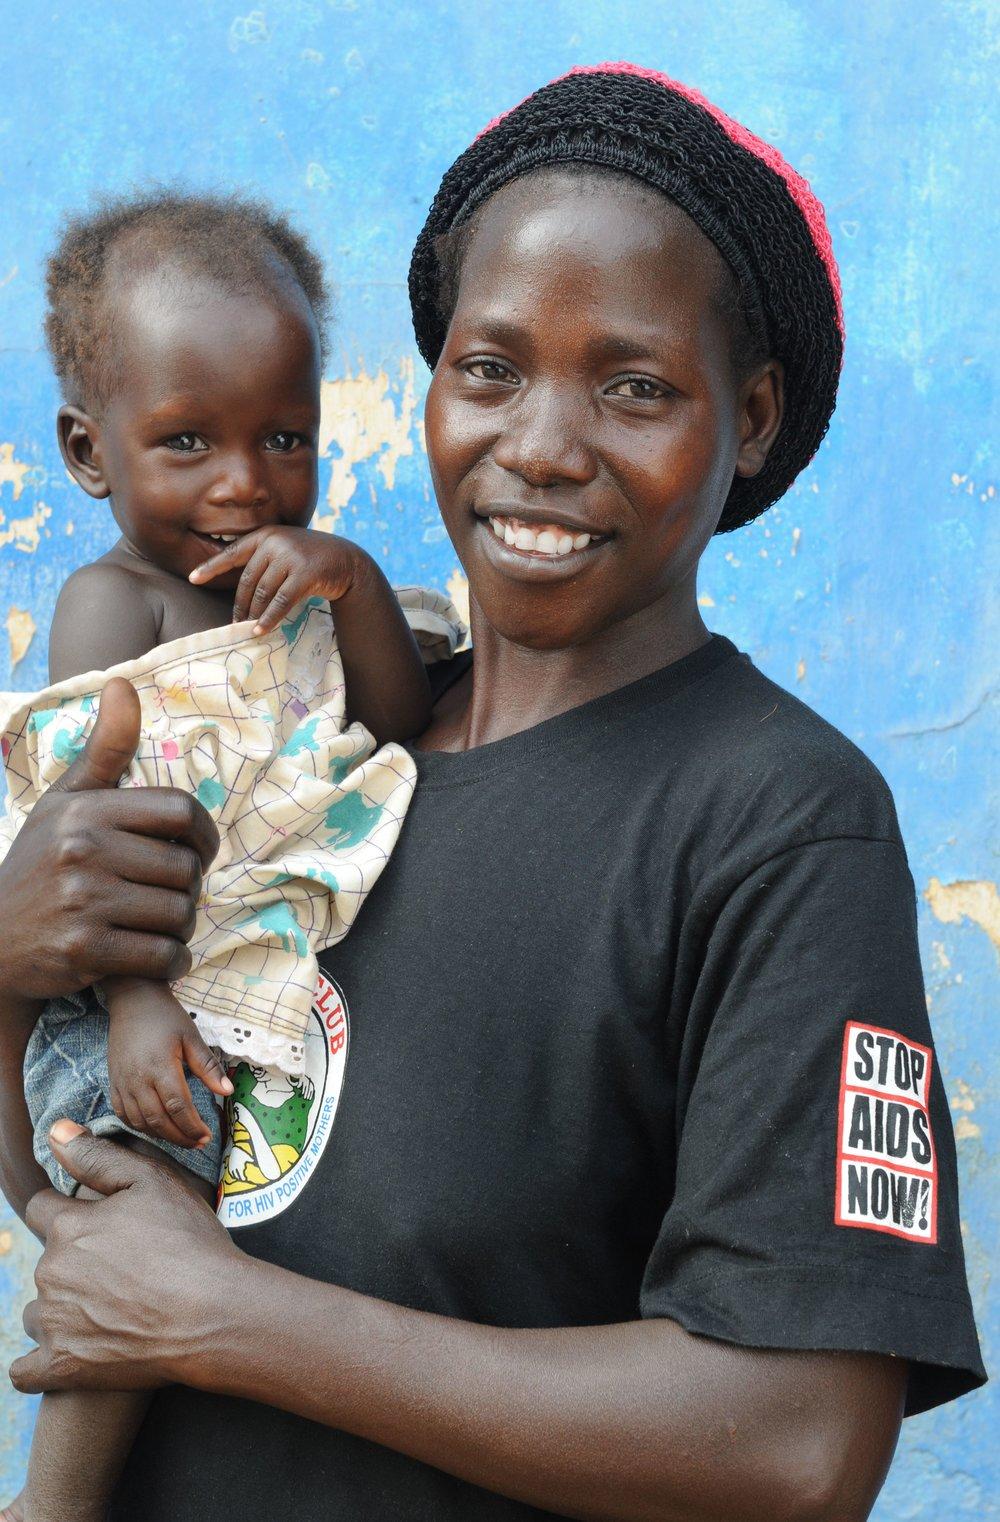 STOP AIDS NOW! in Uganda, Aidsfonds, Foto: Adriaan Backer